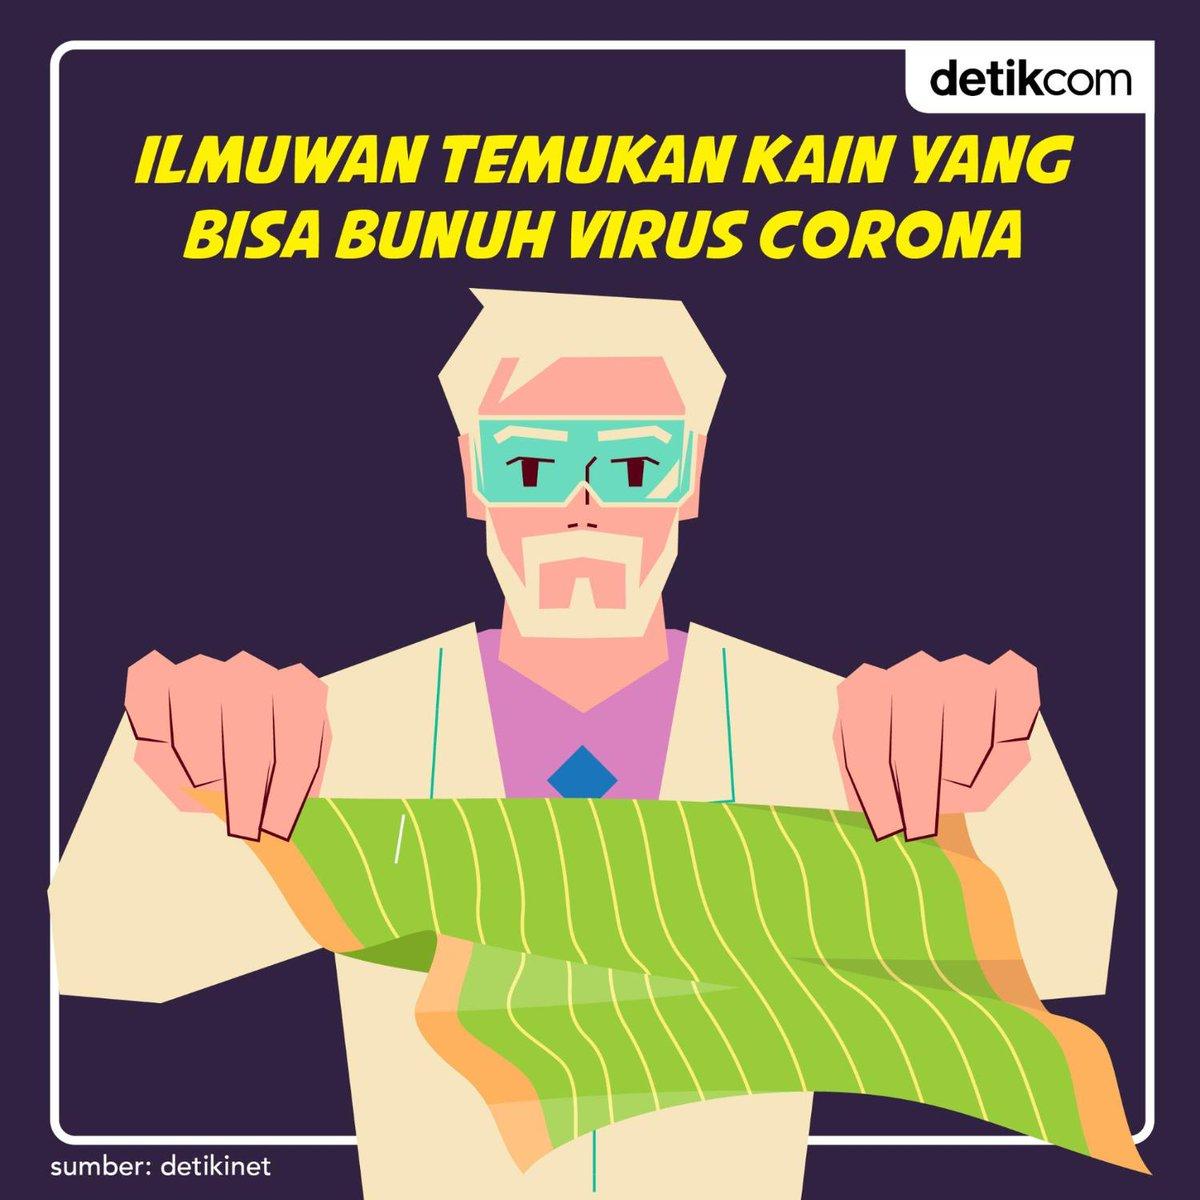 Ilmuwan menemukan kain yang bisa membunuh virus Corona secara instan. Kain ini diperkirakan akan mengubah alat pelindung diri di masa depan. https://t.co/cwOen8GcuQ  #VirusCorona #detikinet https://t.co/o6vHiGo3xW